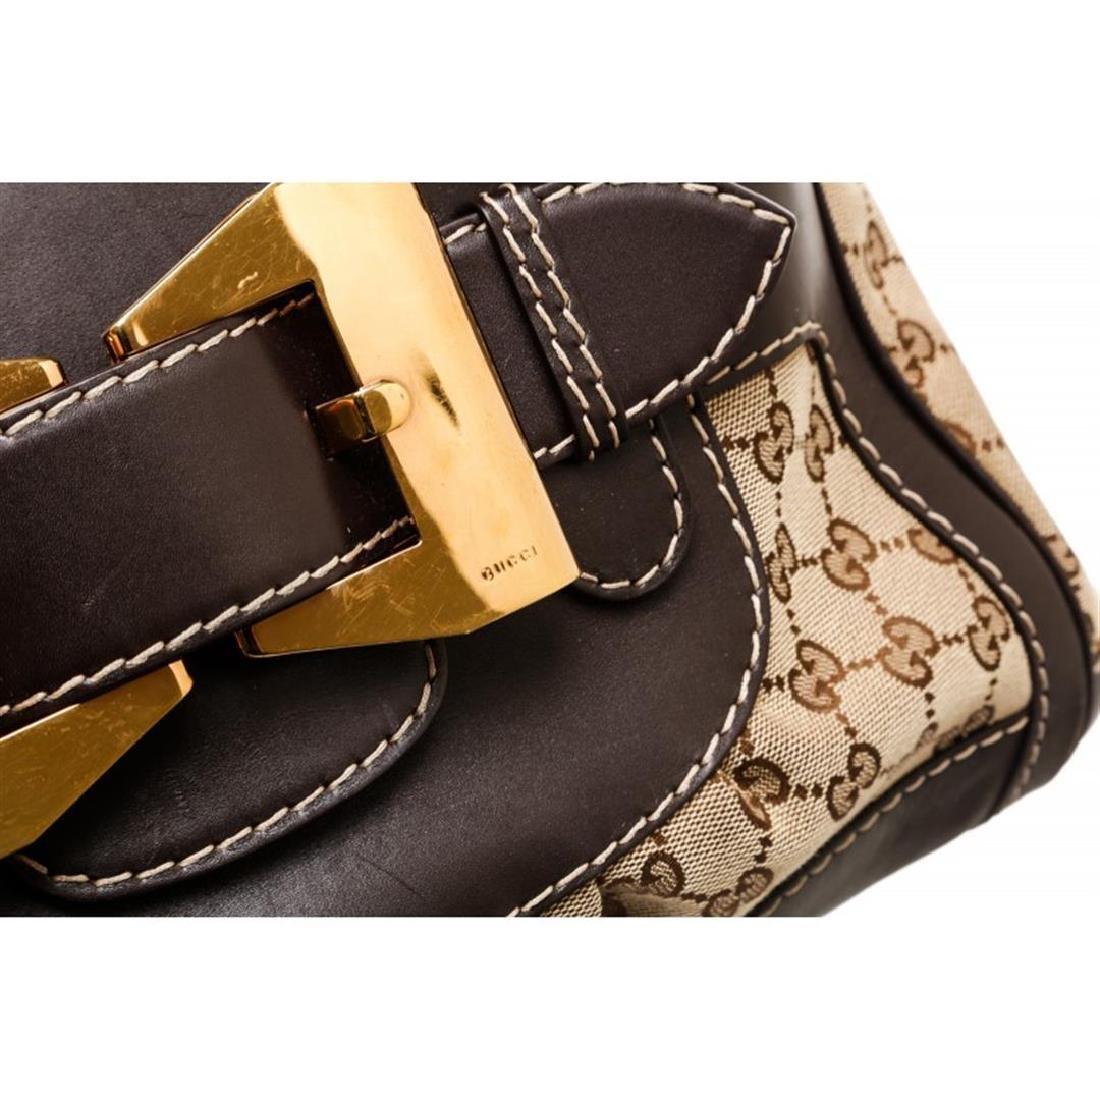 Gucci Beige Canvas Monogram Brown Leather Dialux Queen - 5